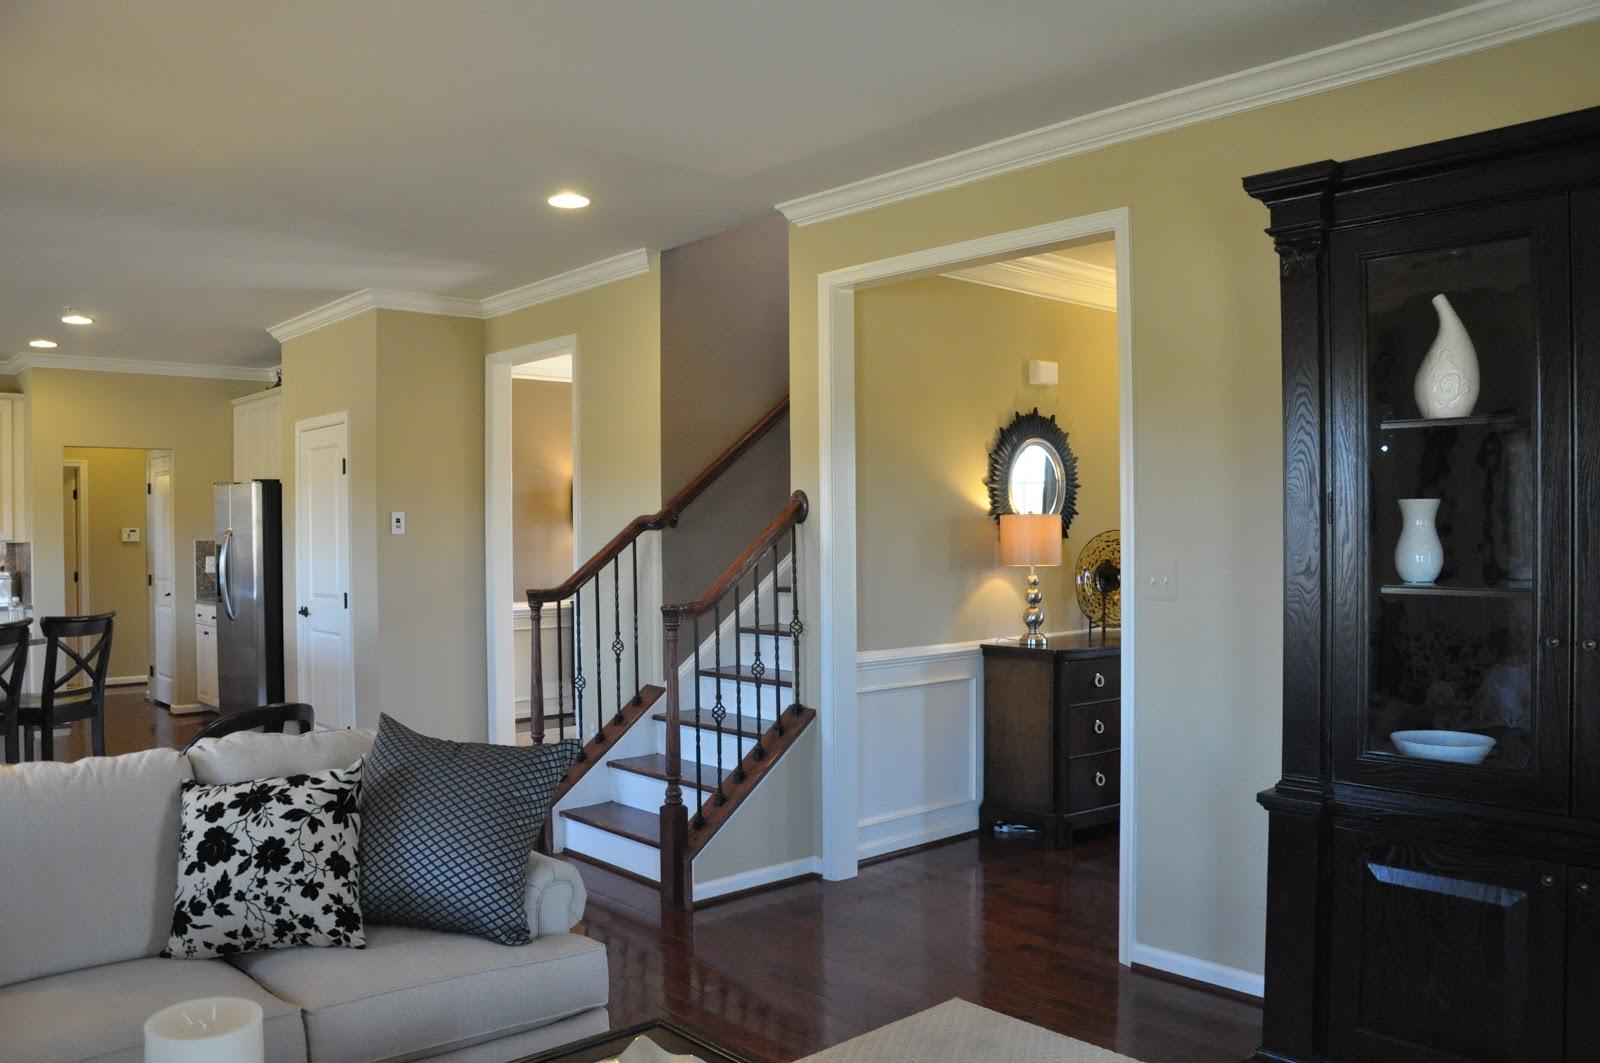 Building a ryan homes ravenna model pics - Home decorating blog plan ...